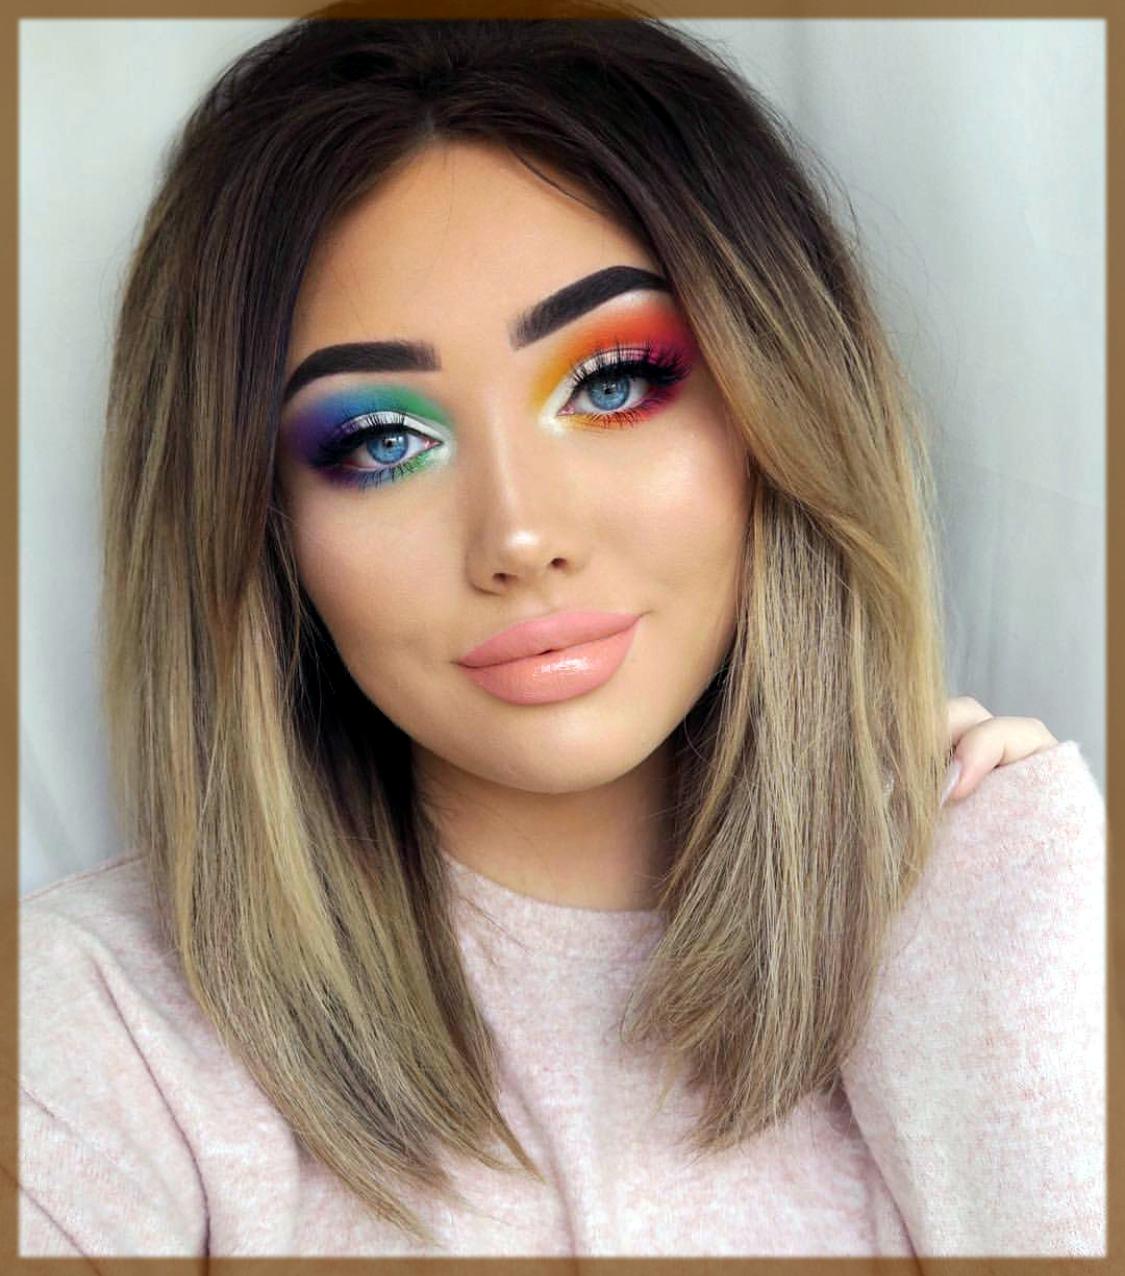 rainbow winter makeup tips and tricks